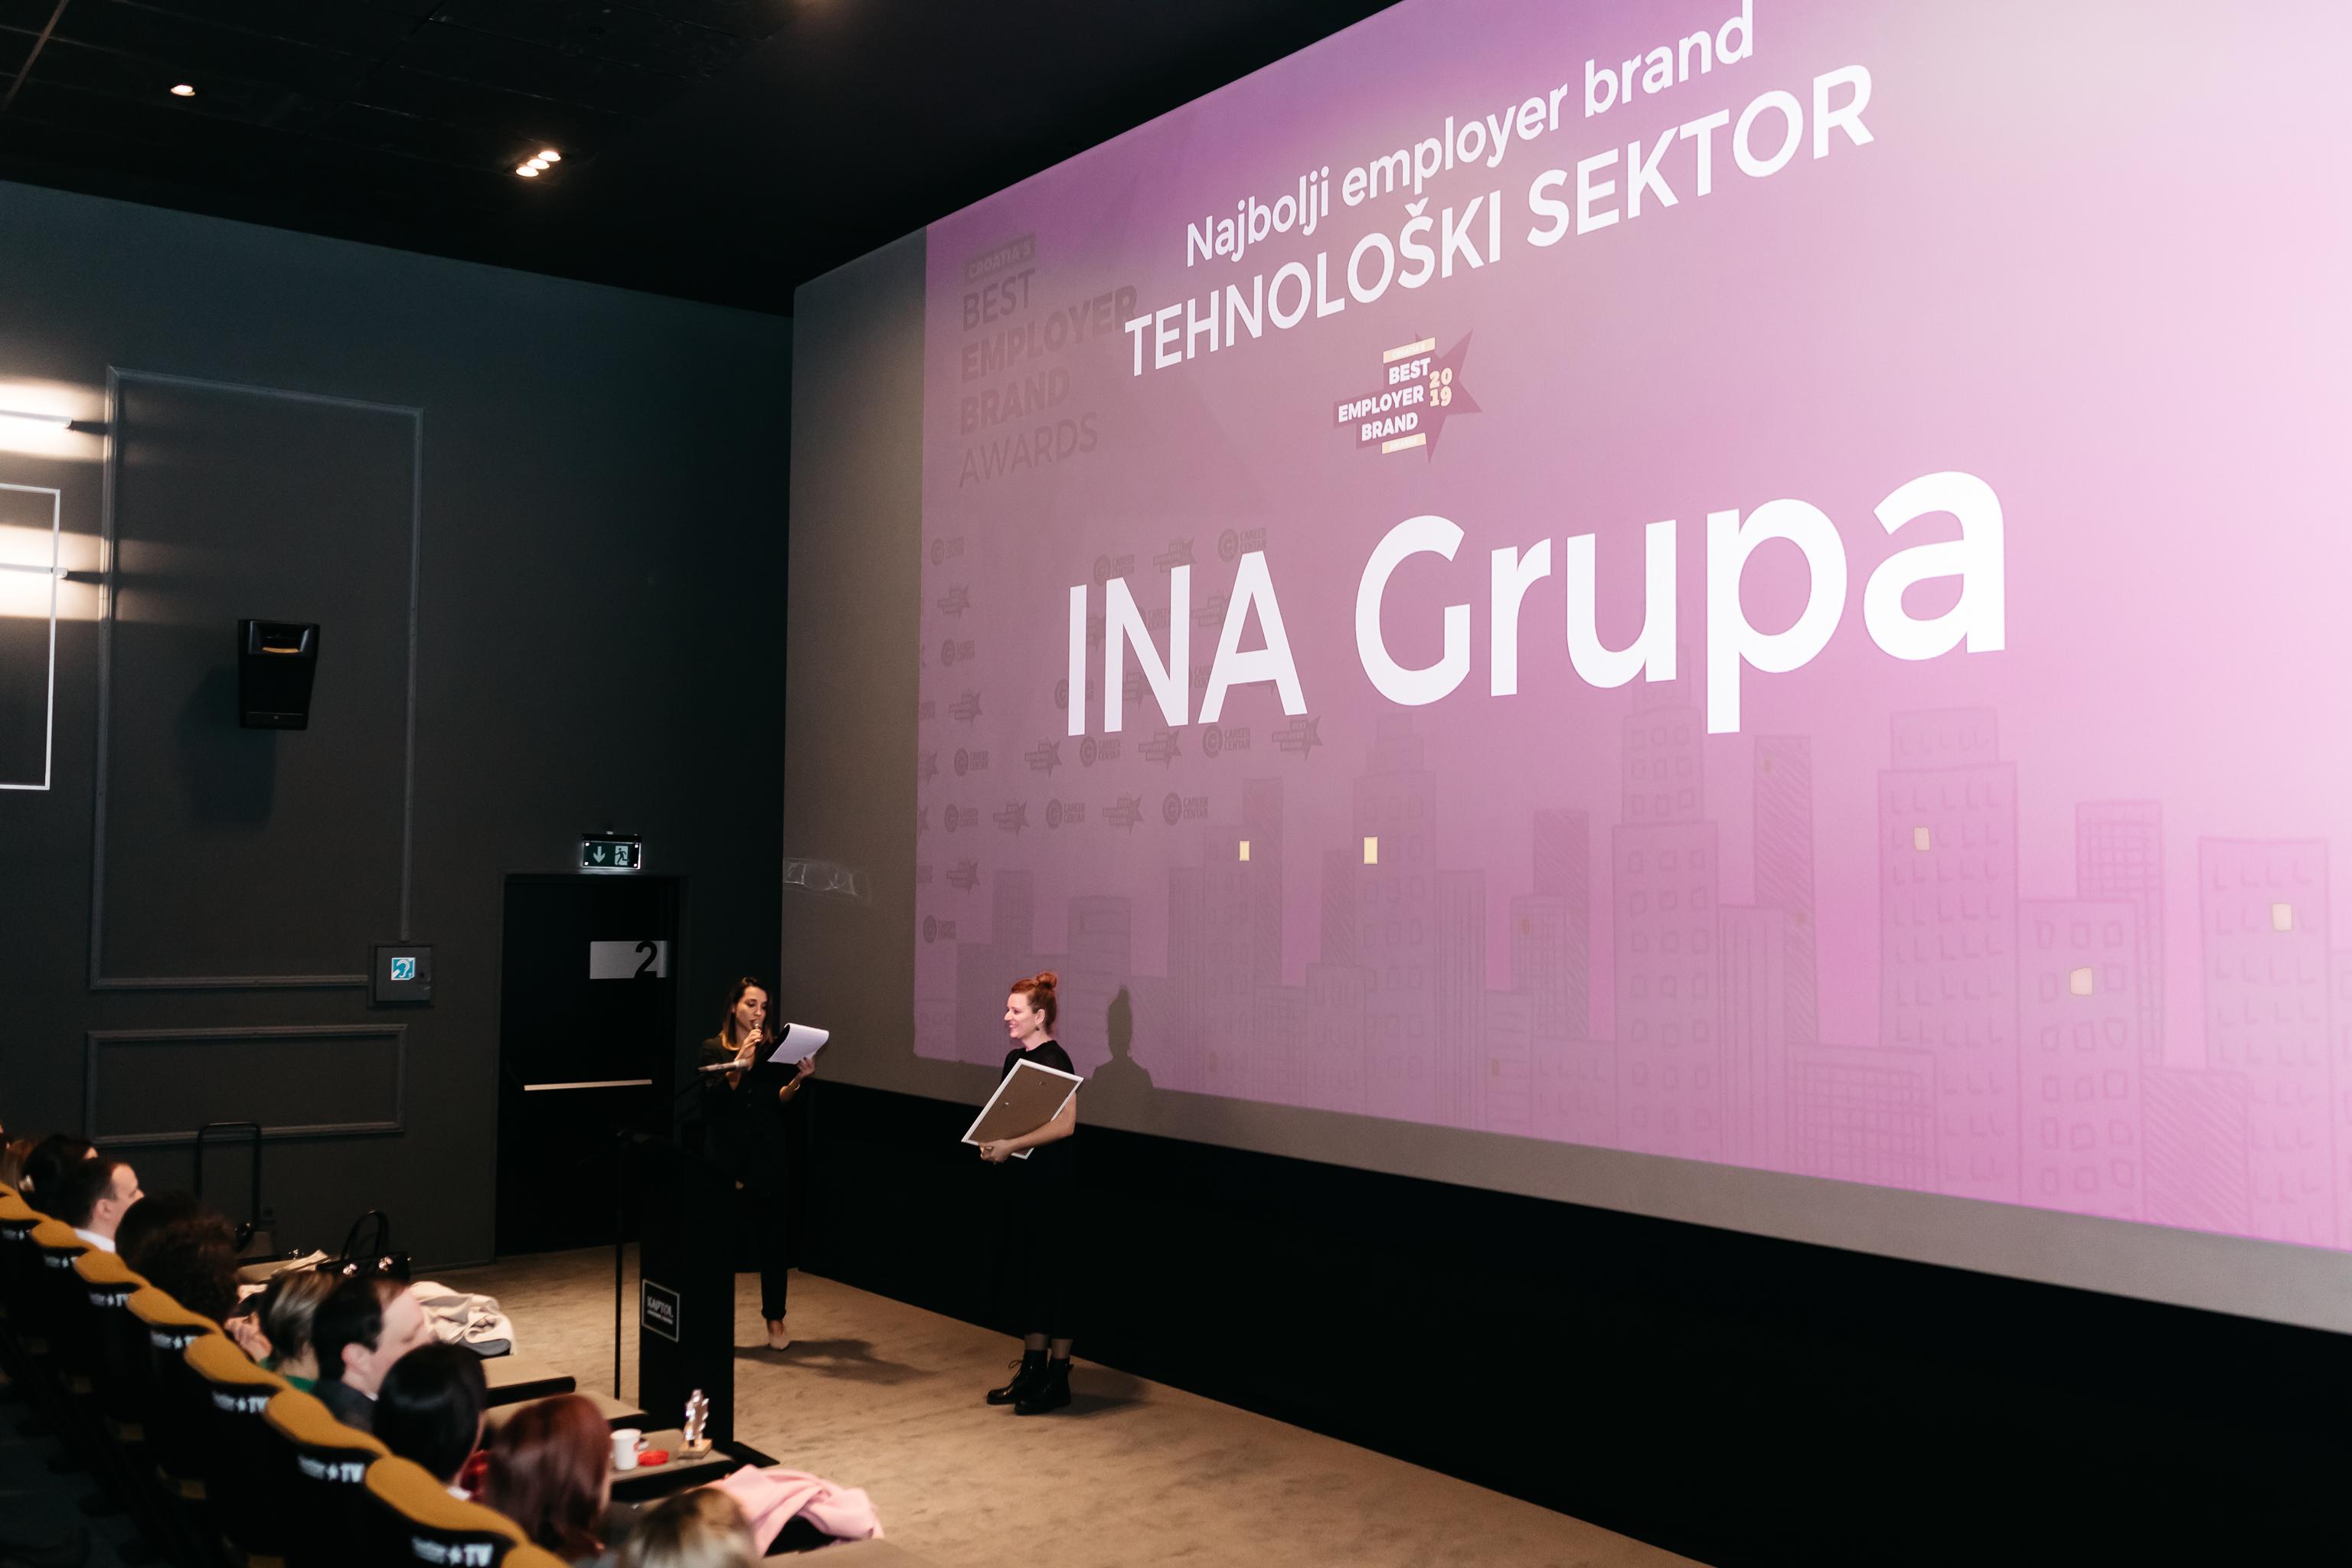 INA Grupa - Tehnološki sektor